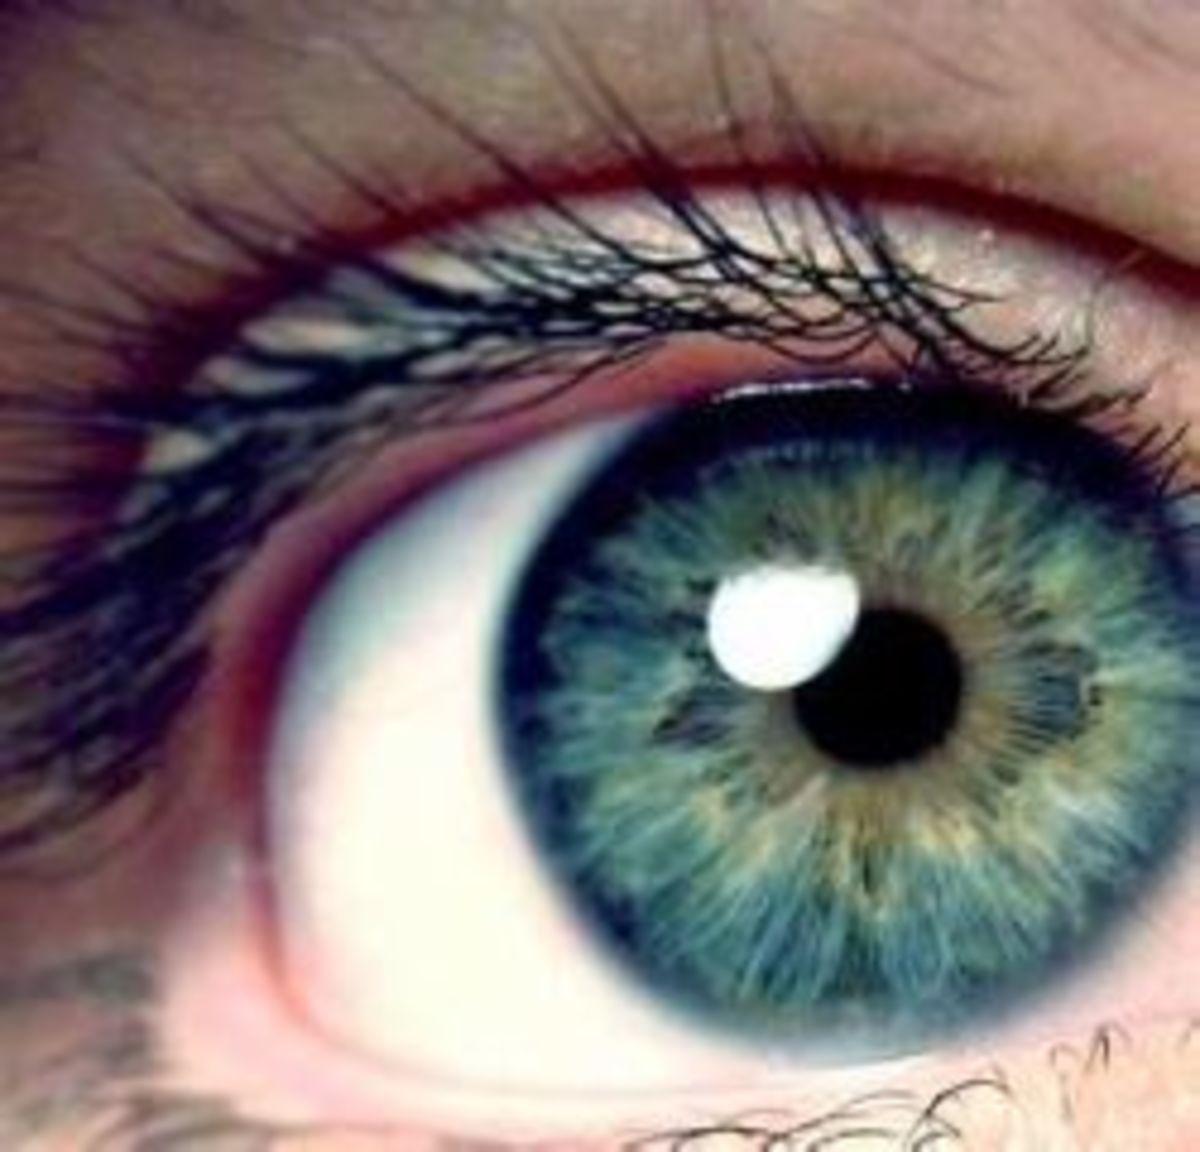 five-senses-seeing-eyes-lesson-plan